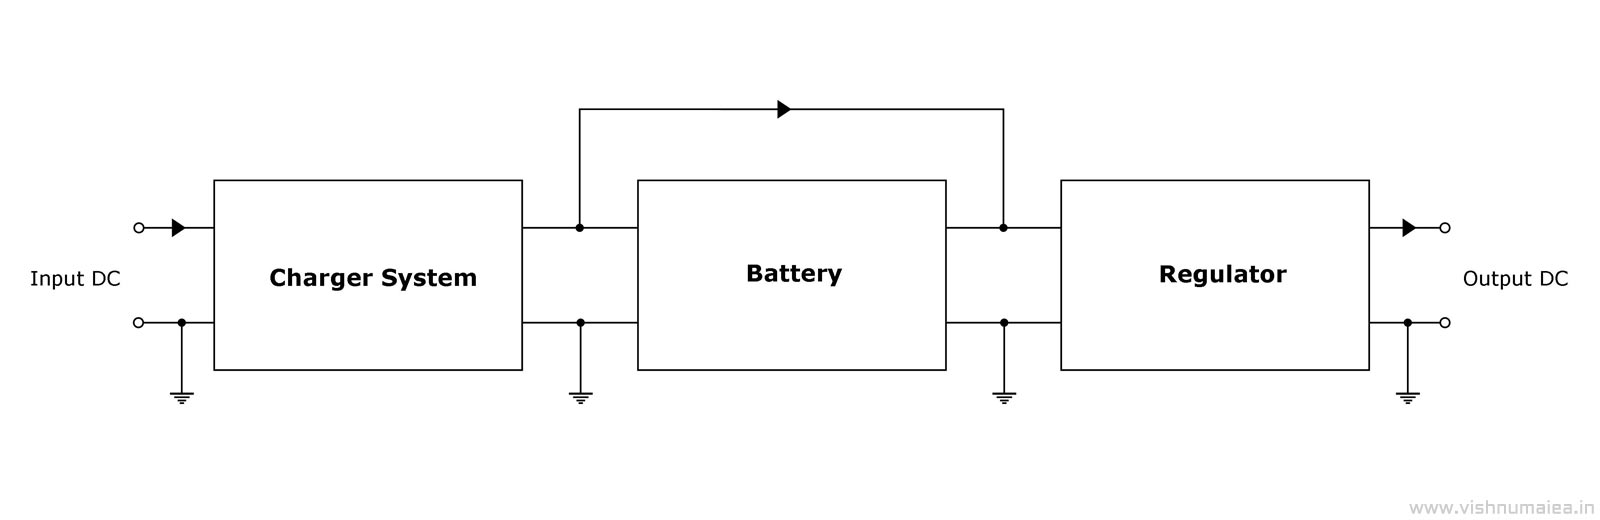 Modem Backup System Block Diagram